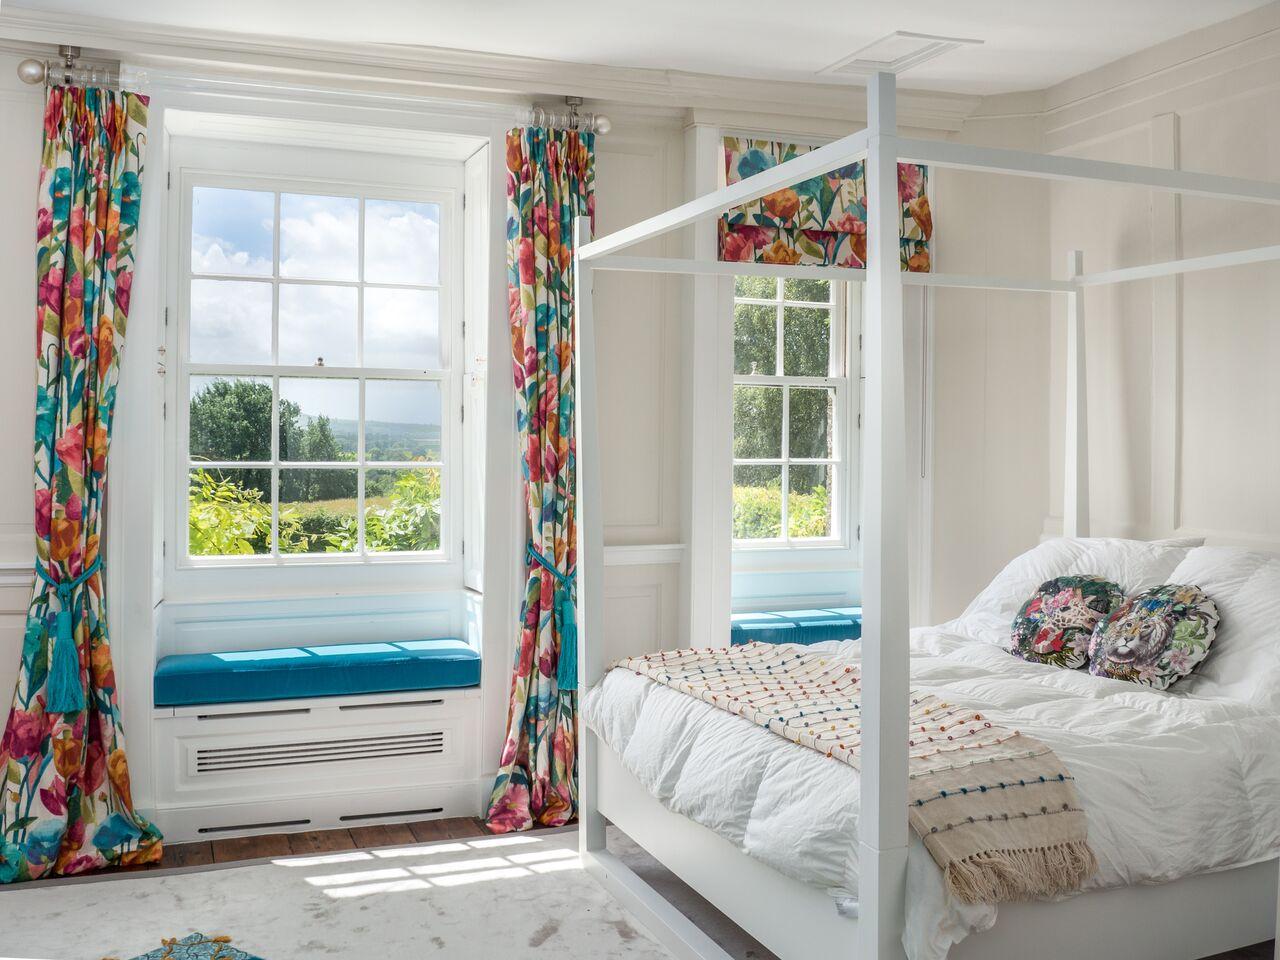 bedroompillows-2.jpg